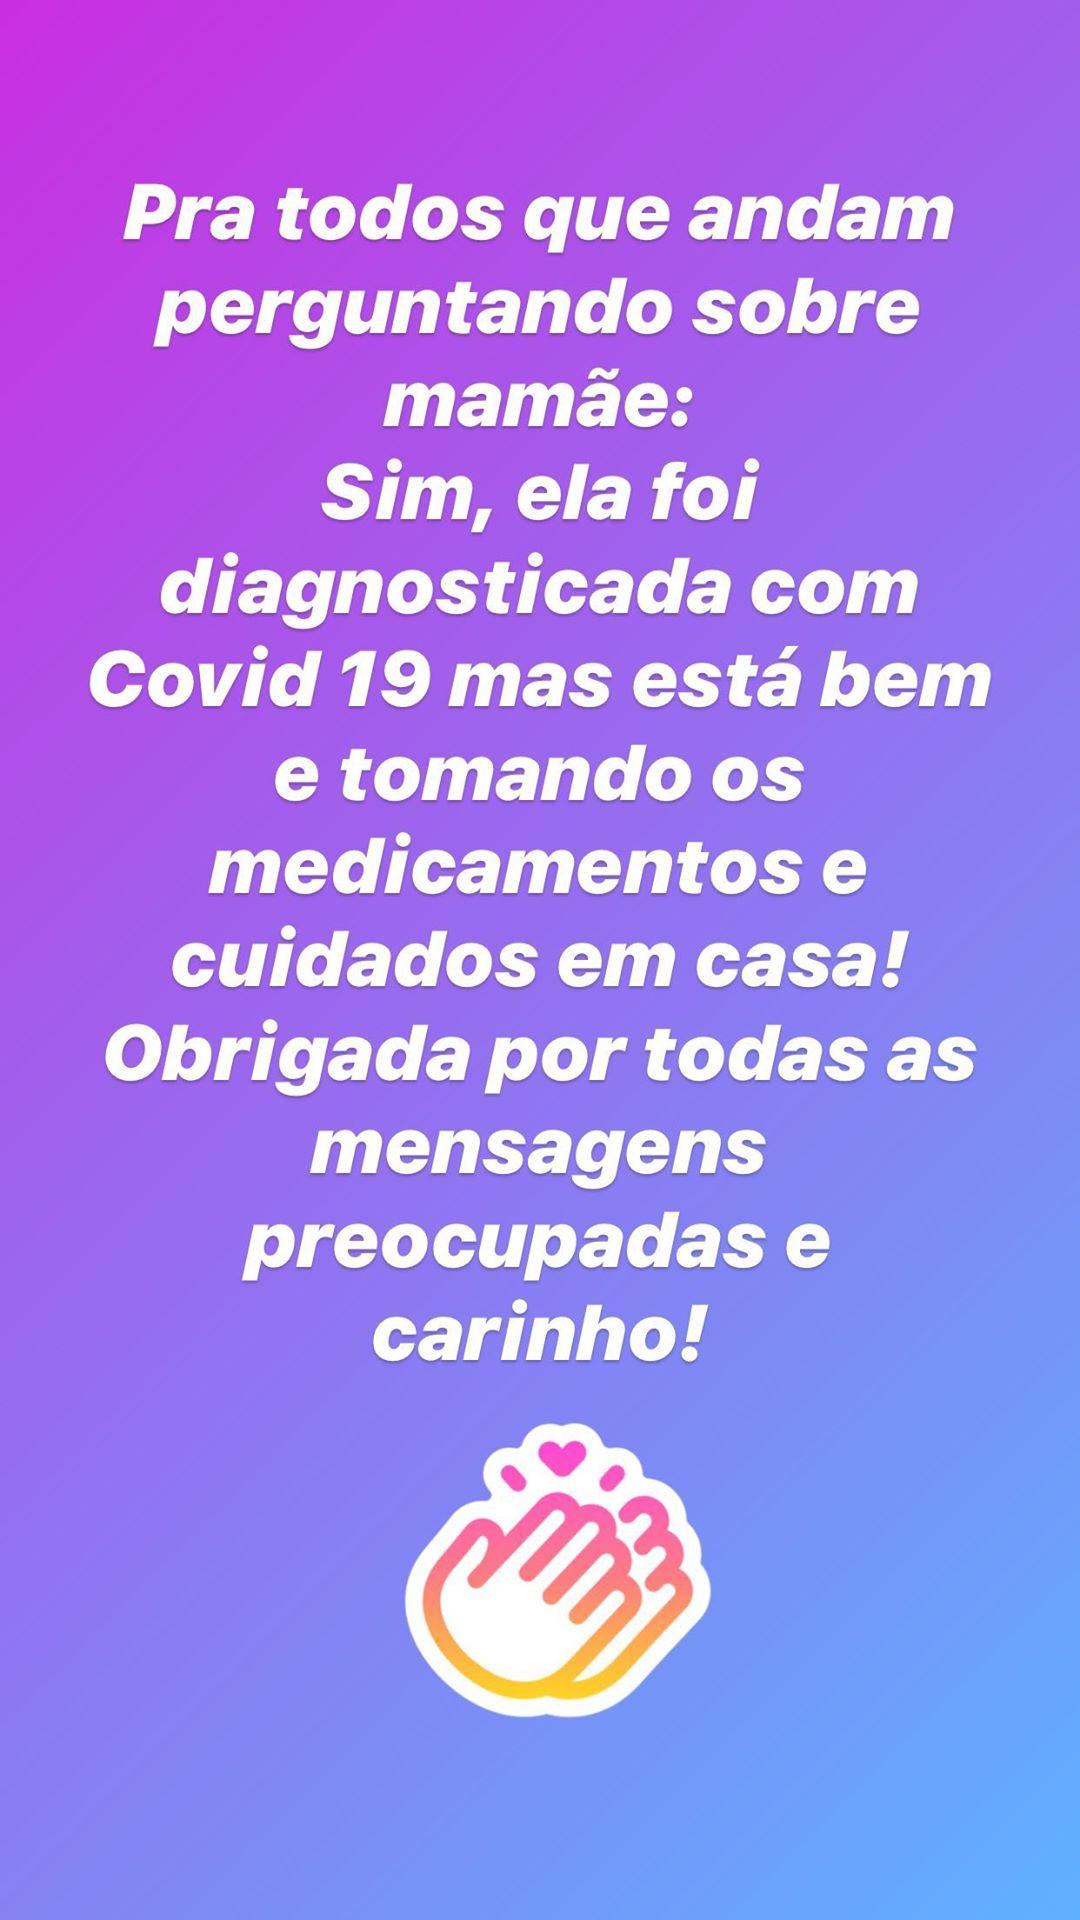 Juliana Paes Mae Mãe De Juliana Paes Testa Positivo À Covid-19